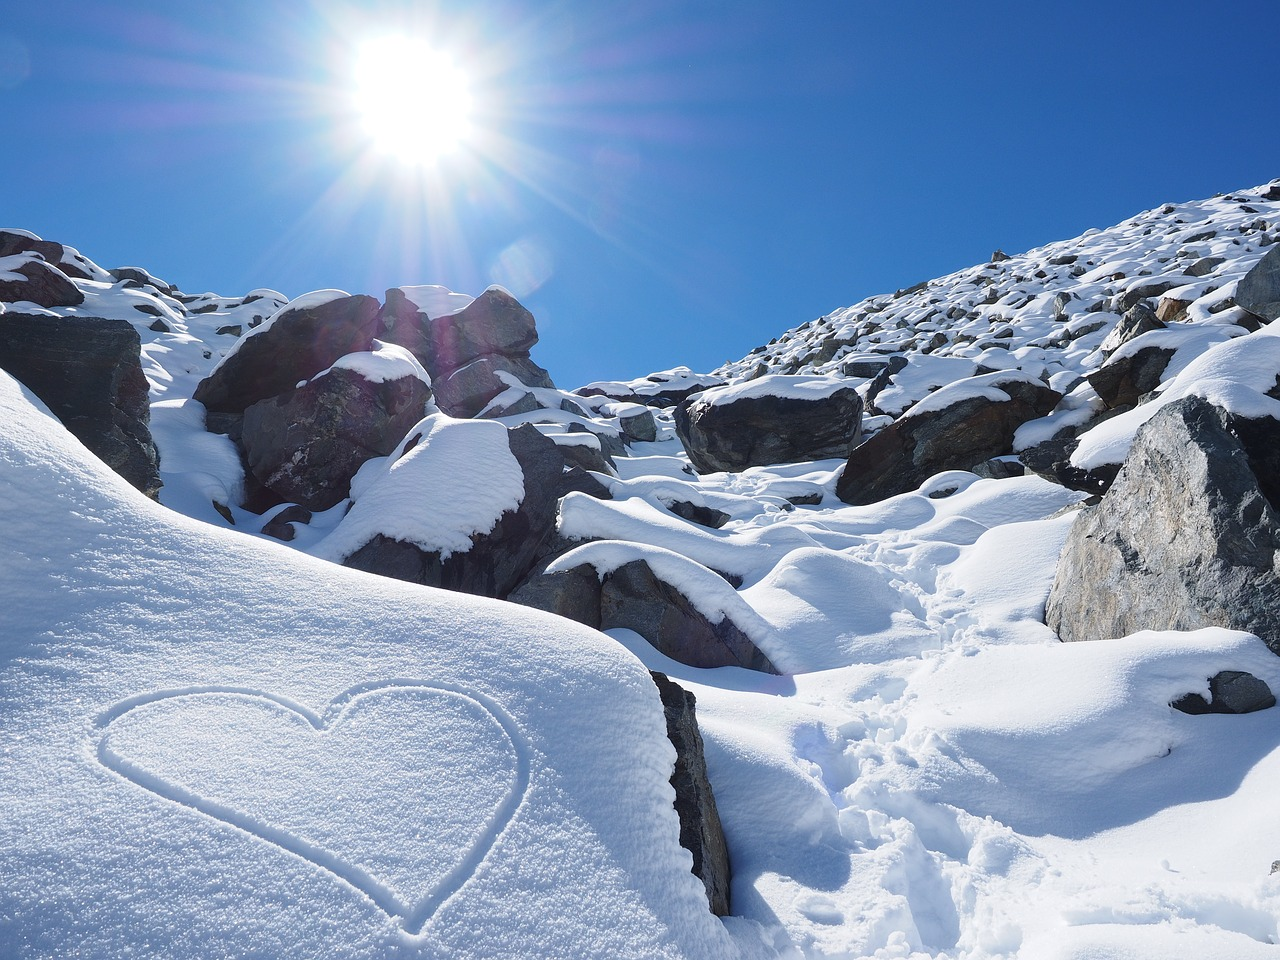 Rumi Heart White as Snow